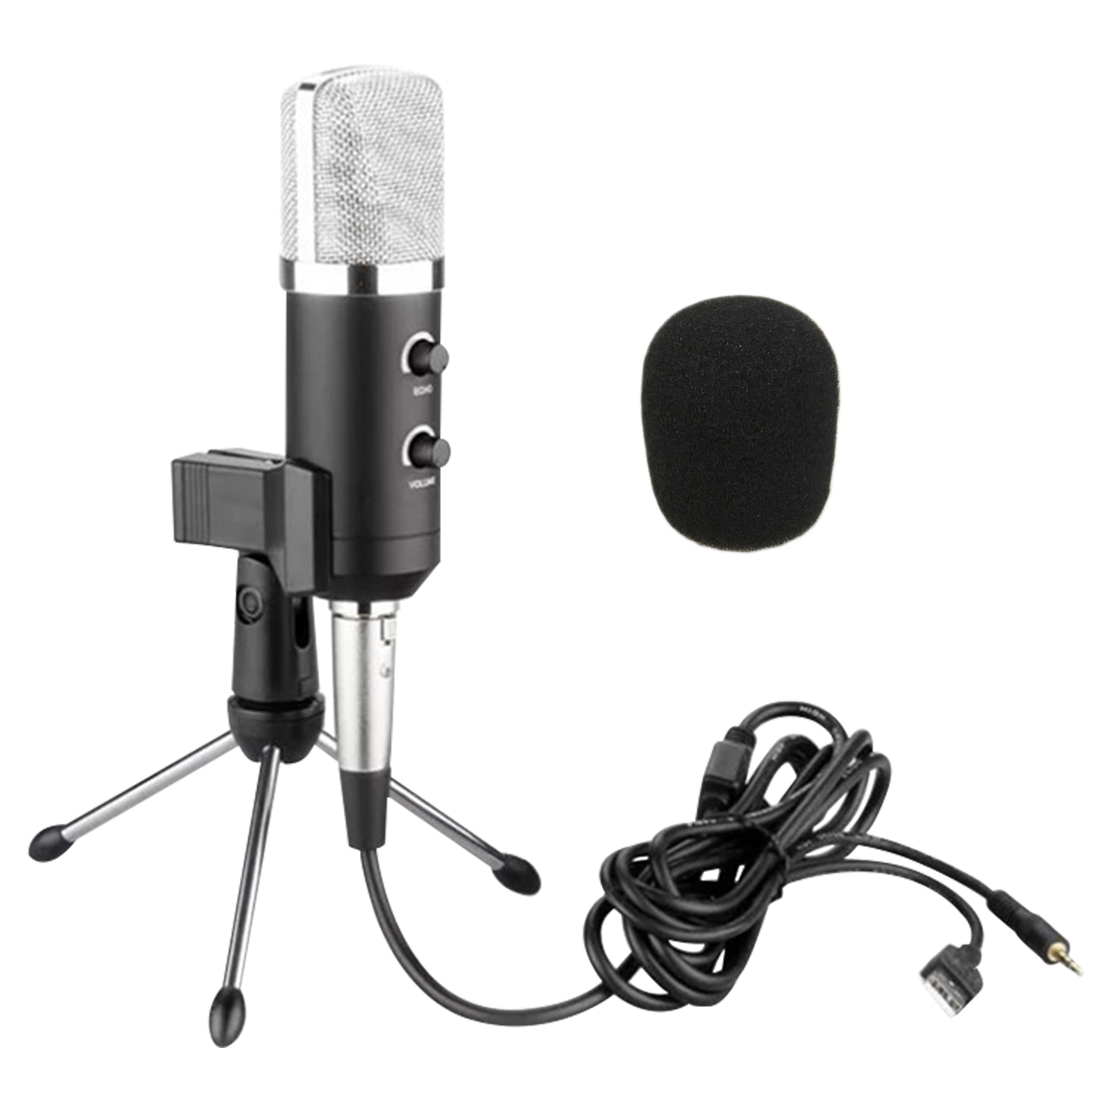 buy centechia hot sale handheld condenser microphone usb computer microphone. Black Bedroom Furniture Sets. Home Design Ideas